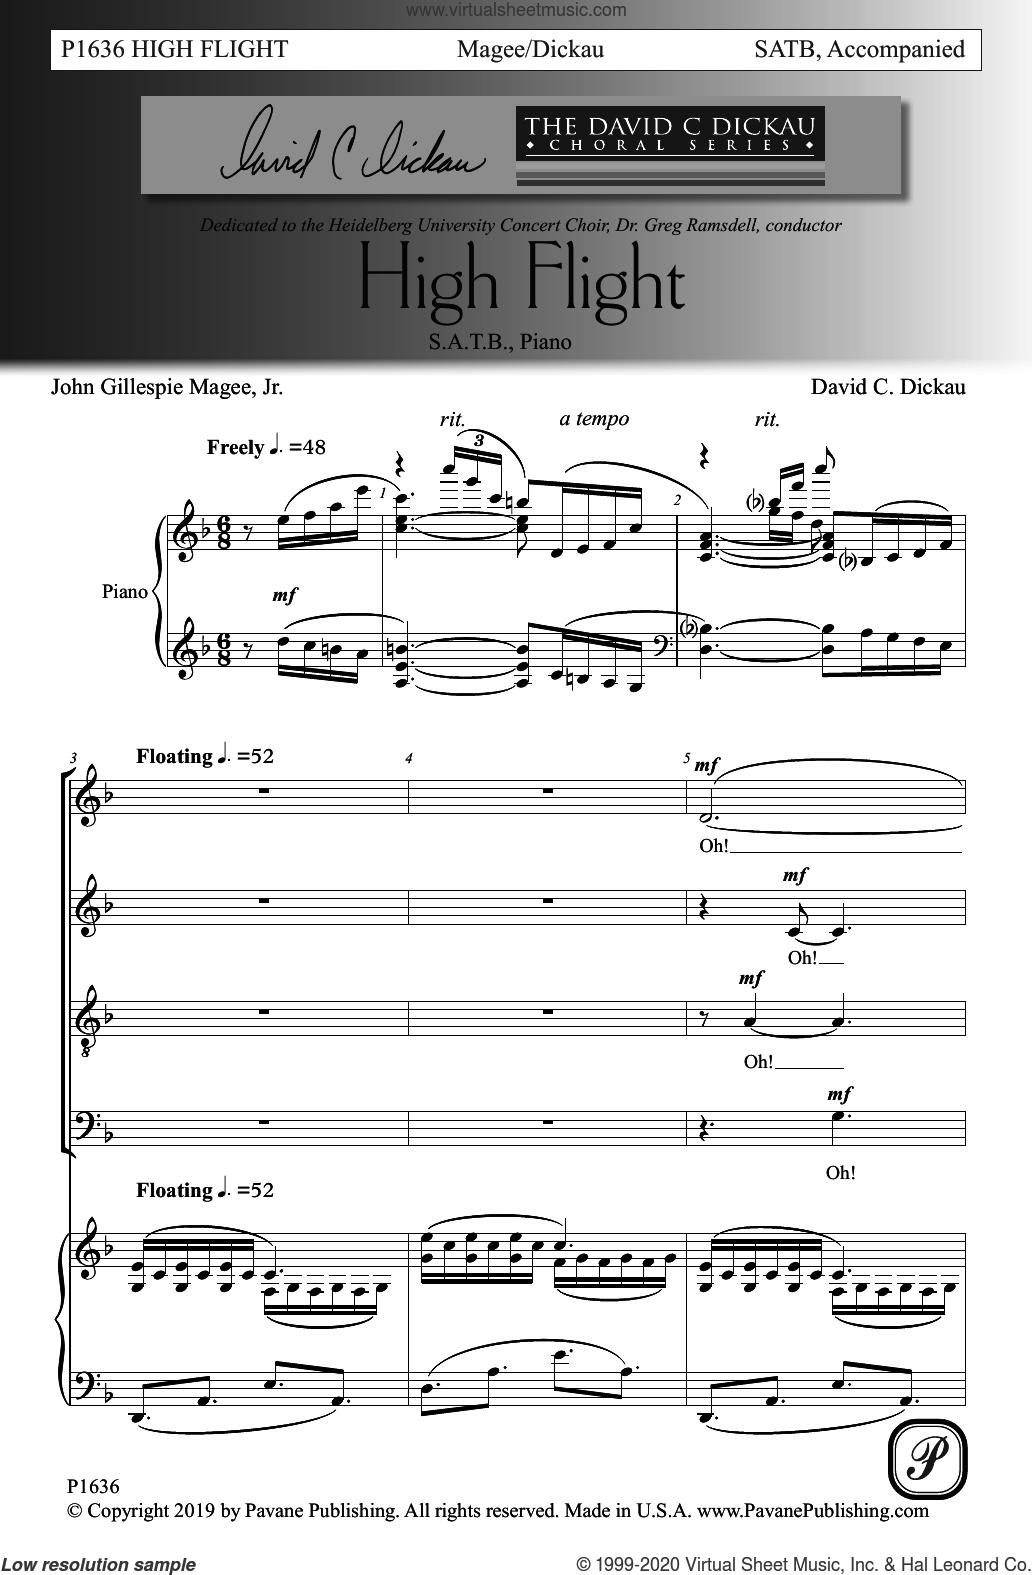 High Flight sheet music for choir (SATB: soprano, alto, tenor, bass) by David C. Dickau, John Gillespie Magee, Jr. and John Gillespie Magee, Jr. and David C. Dickau, intermediate skill level